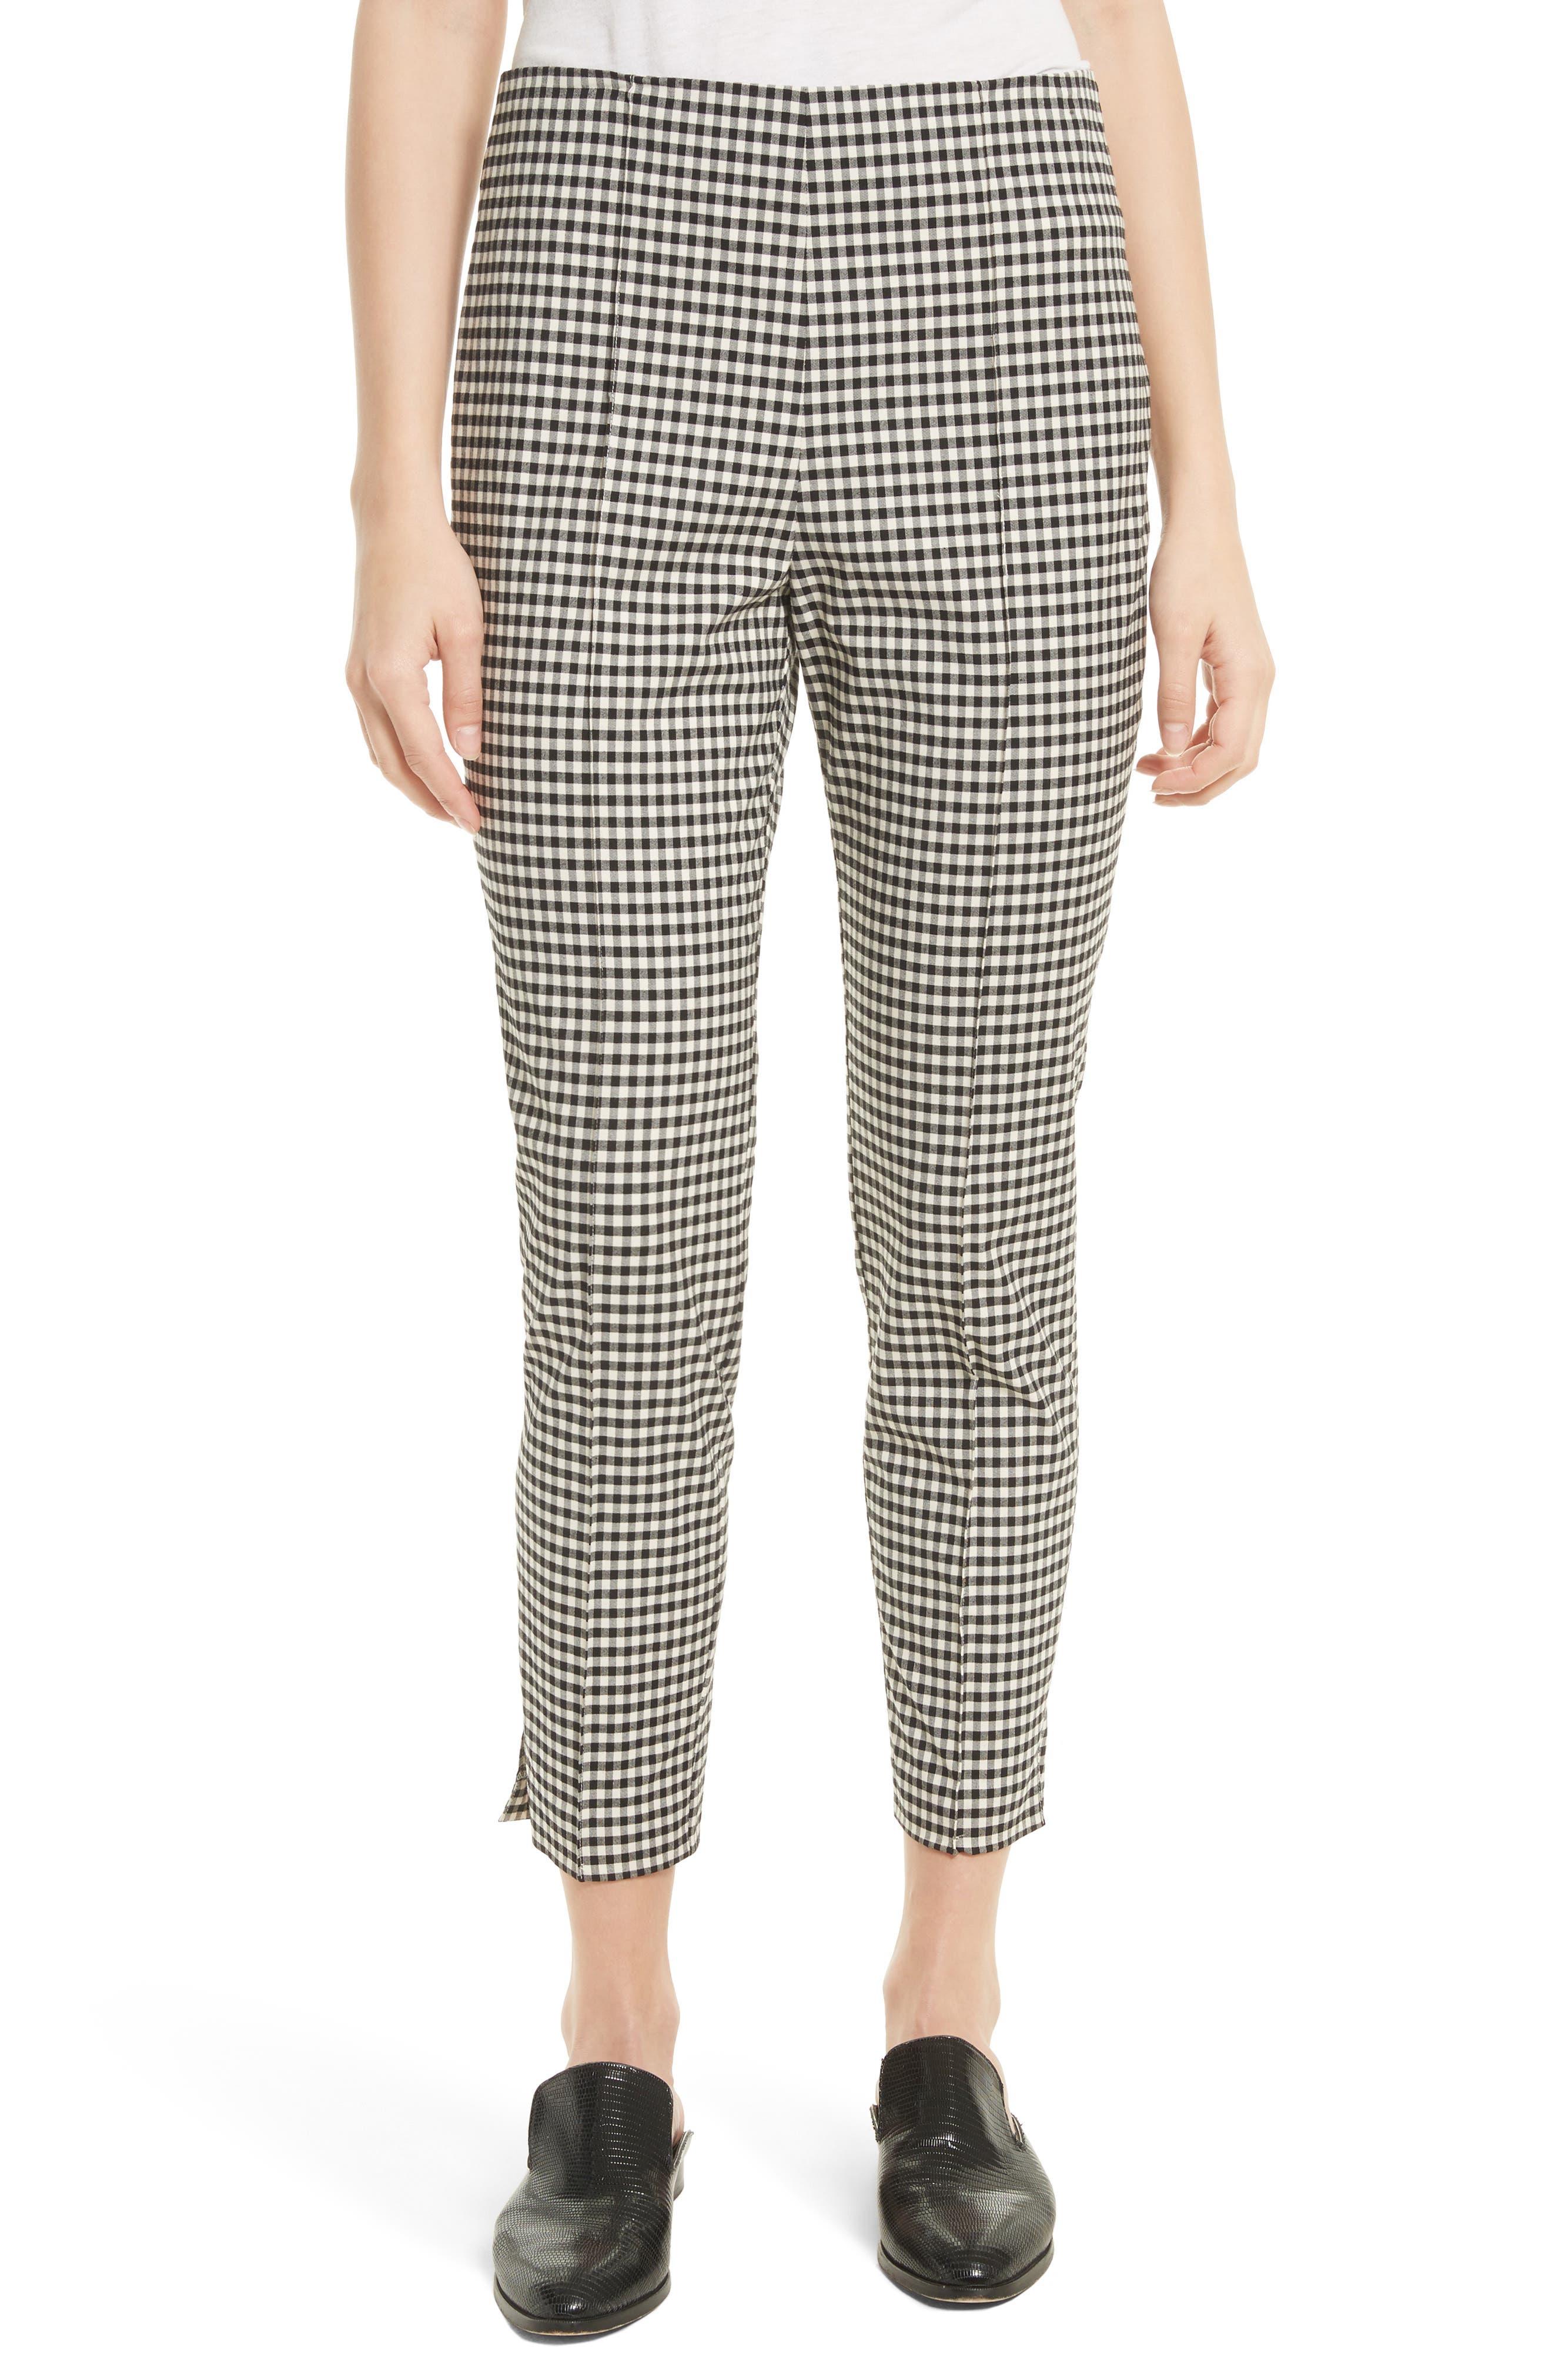 Alternate Image 1 Selected - Veronica Beard Tee High Waisted Seam Trousers